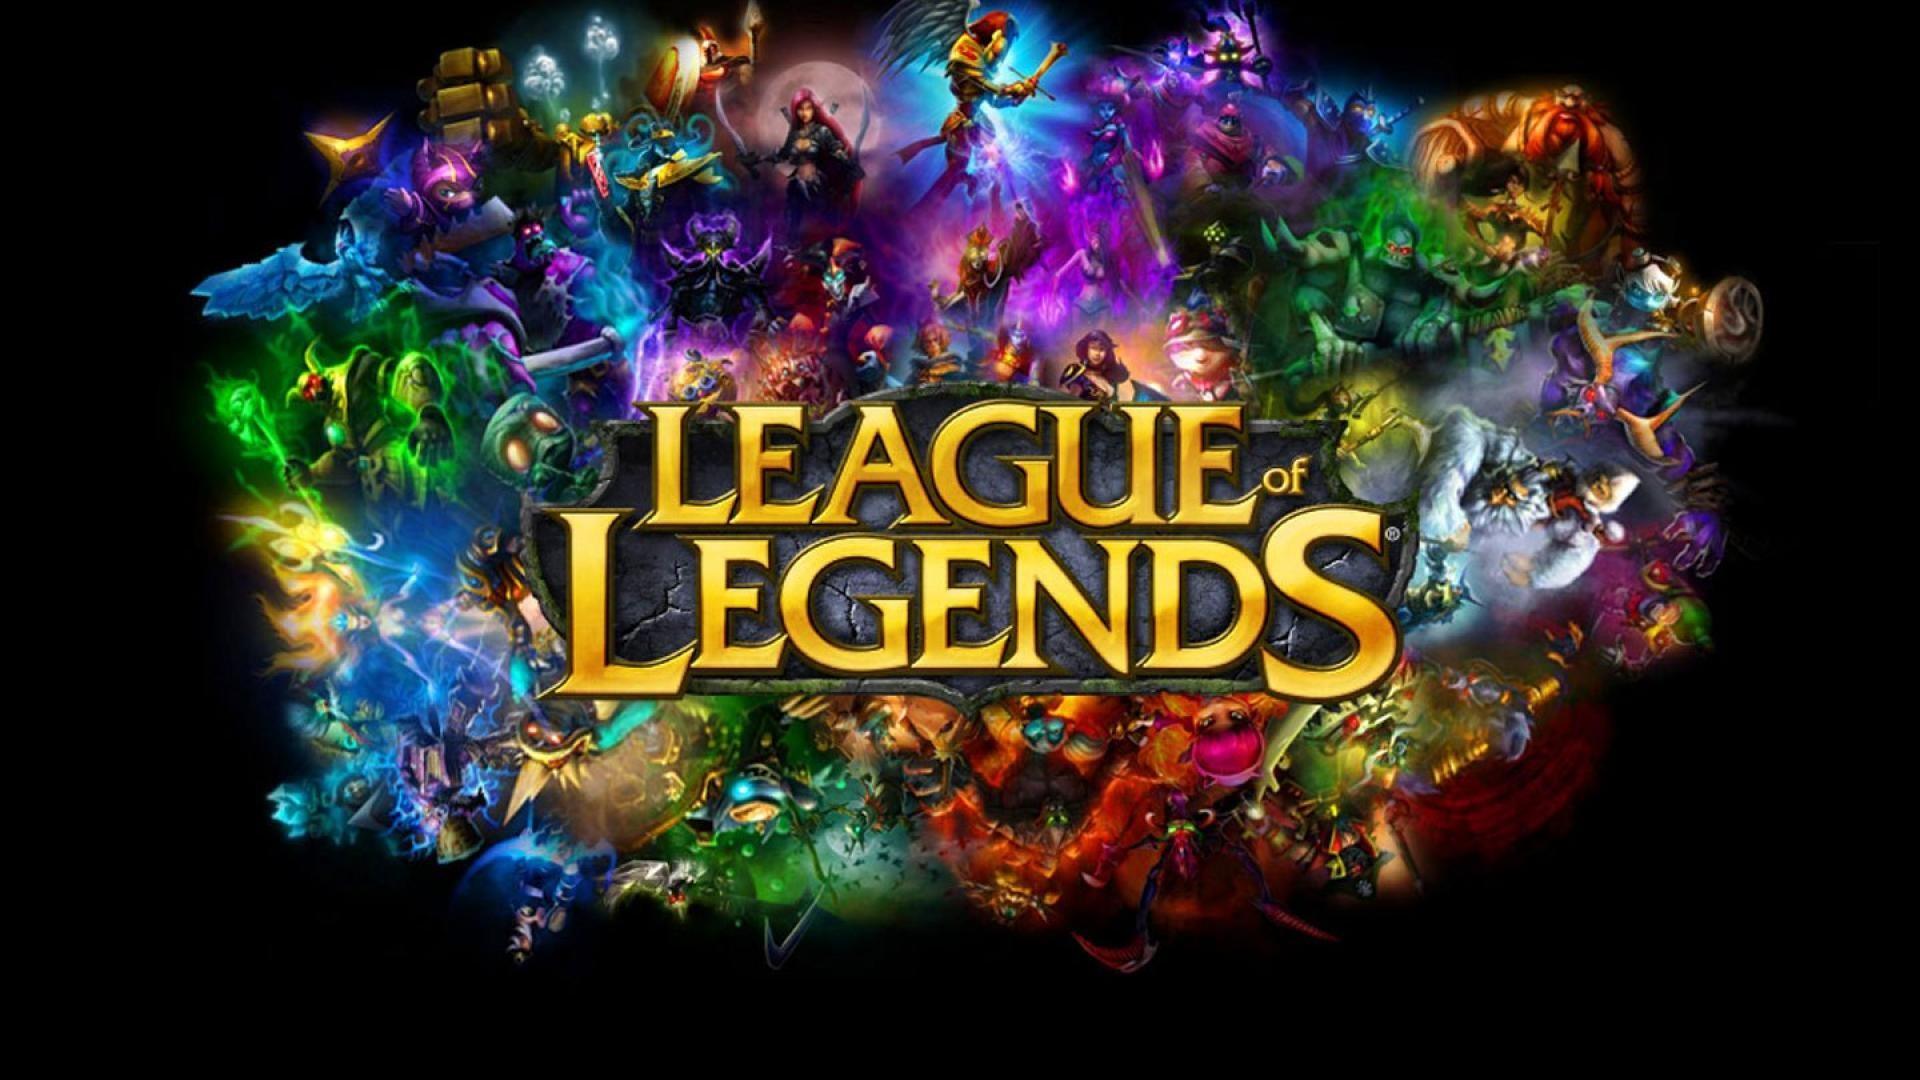 League of legends tablet laptop wallpapers hd desktop backgrounds